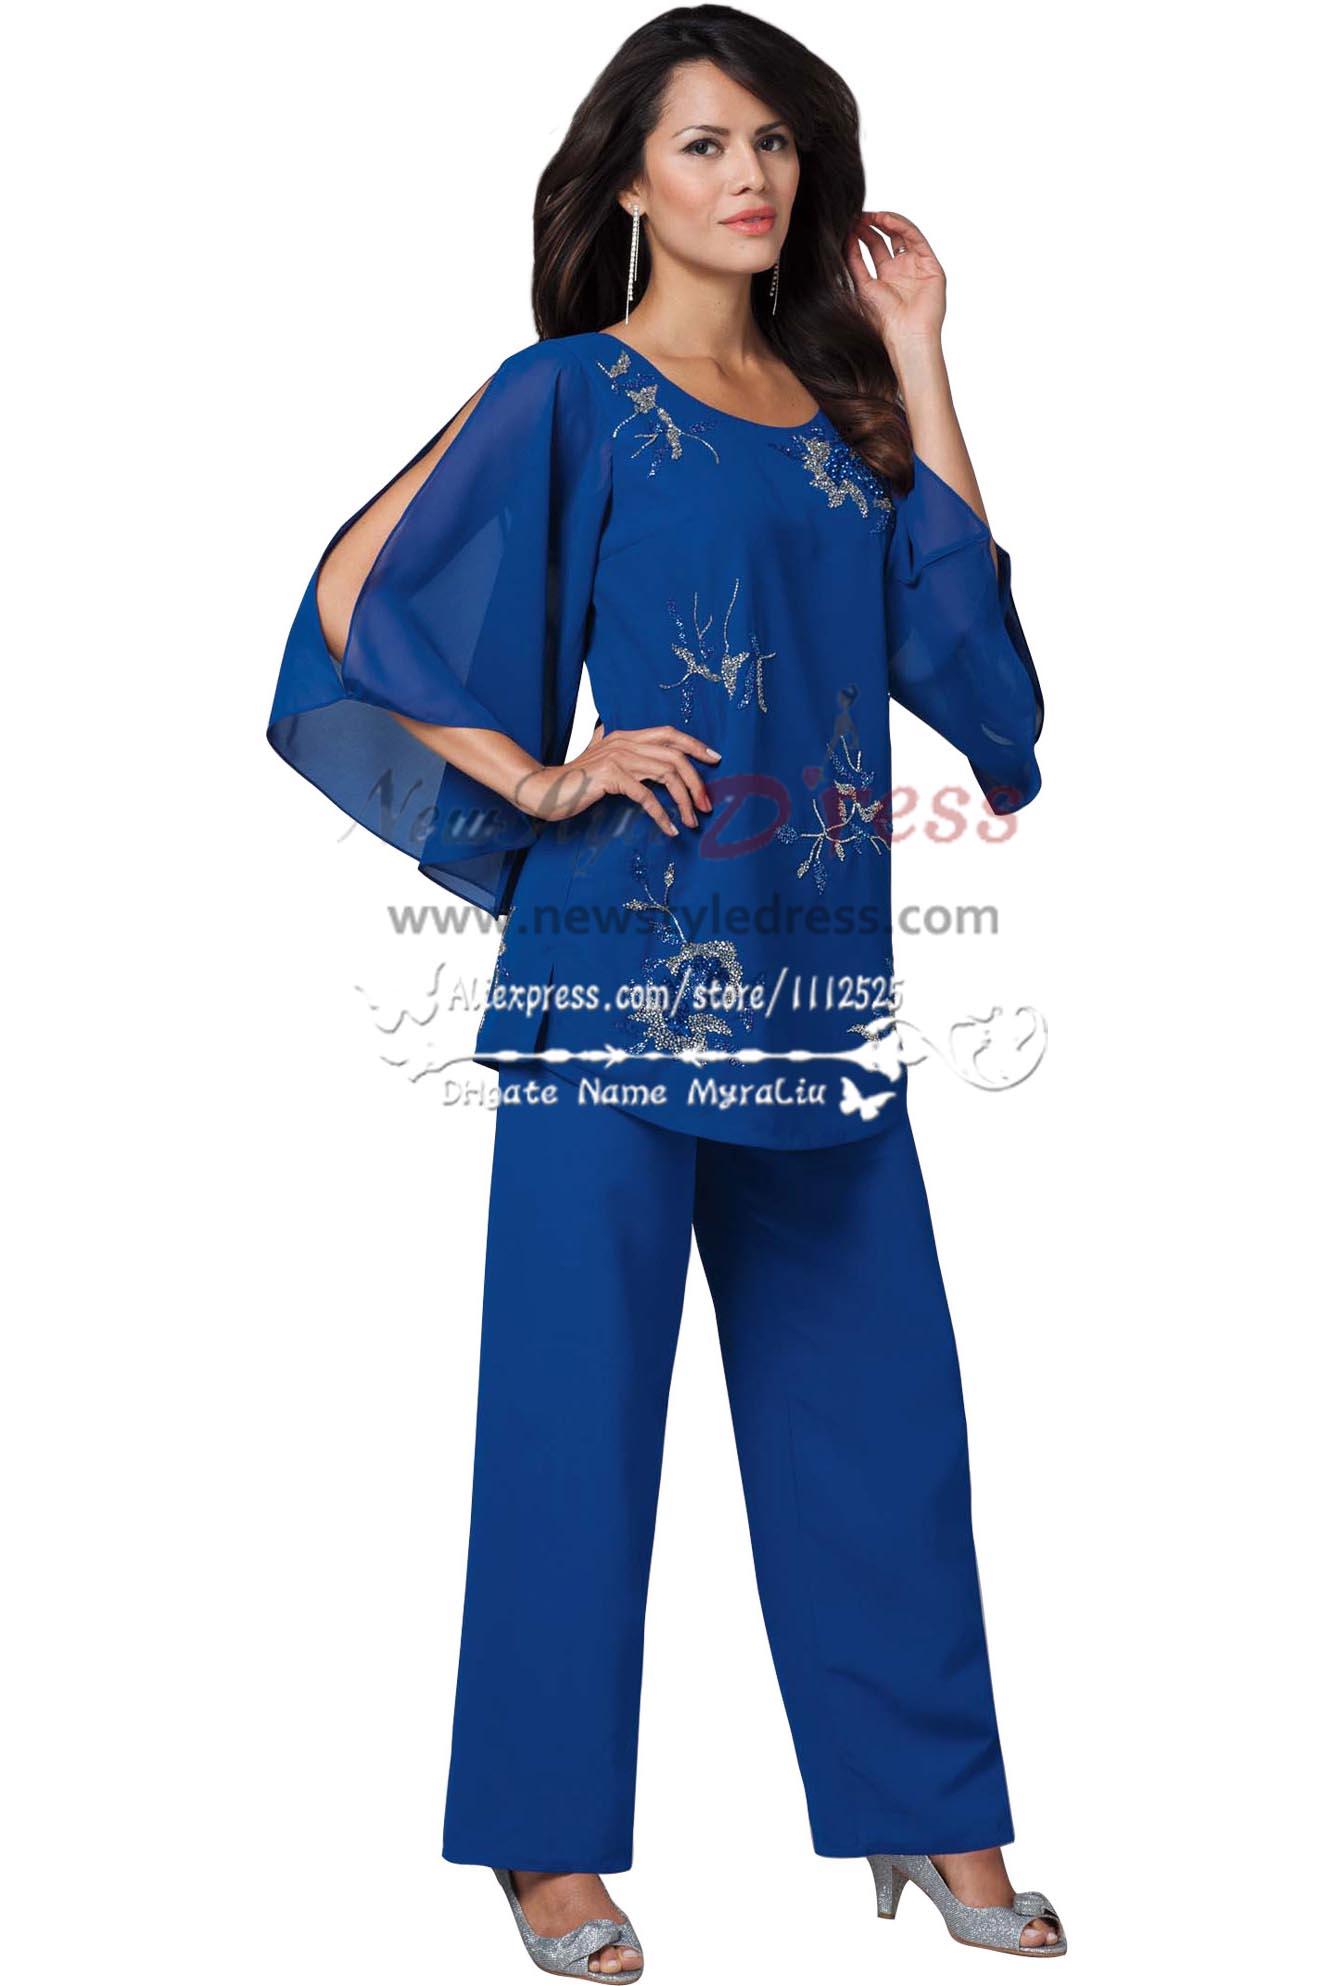 Royal Blue mother of the bride pants suit have a elastic waist